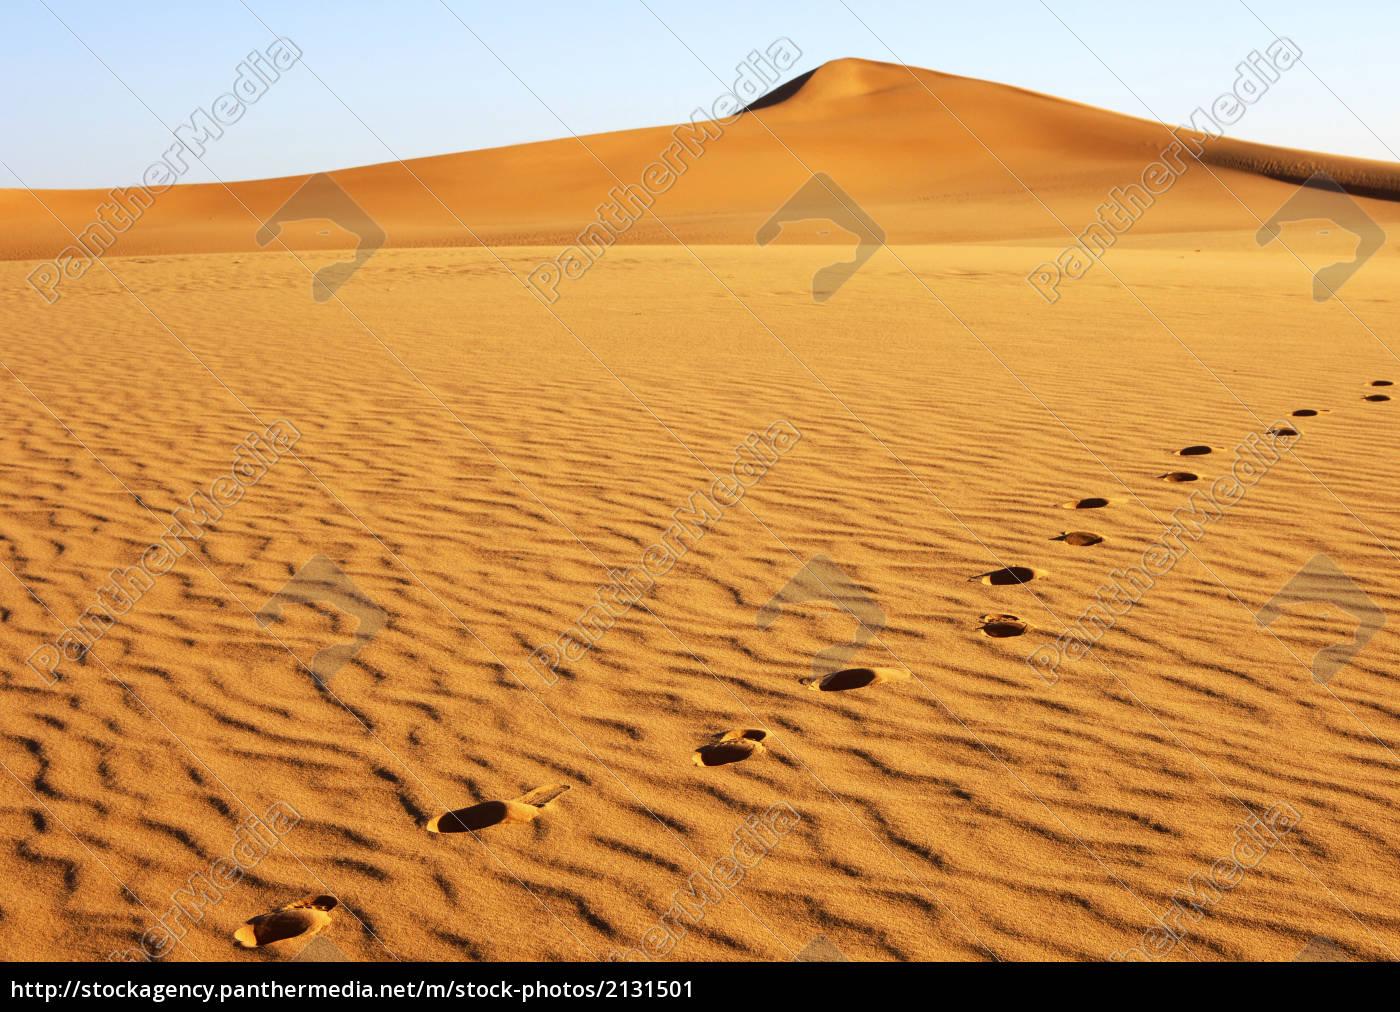 Stock Photo 2131501 Footprints On A Sand Dune Sahara